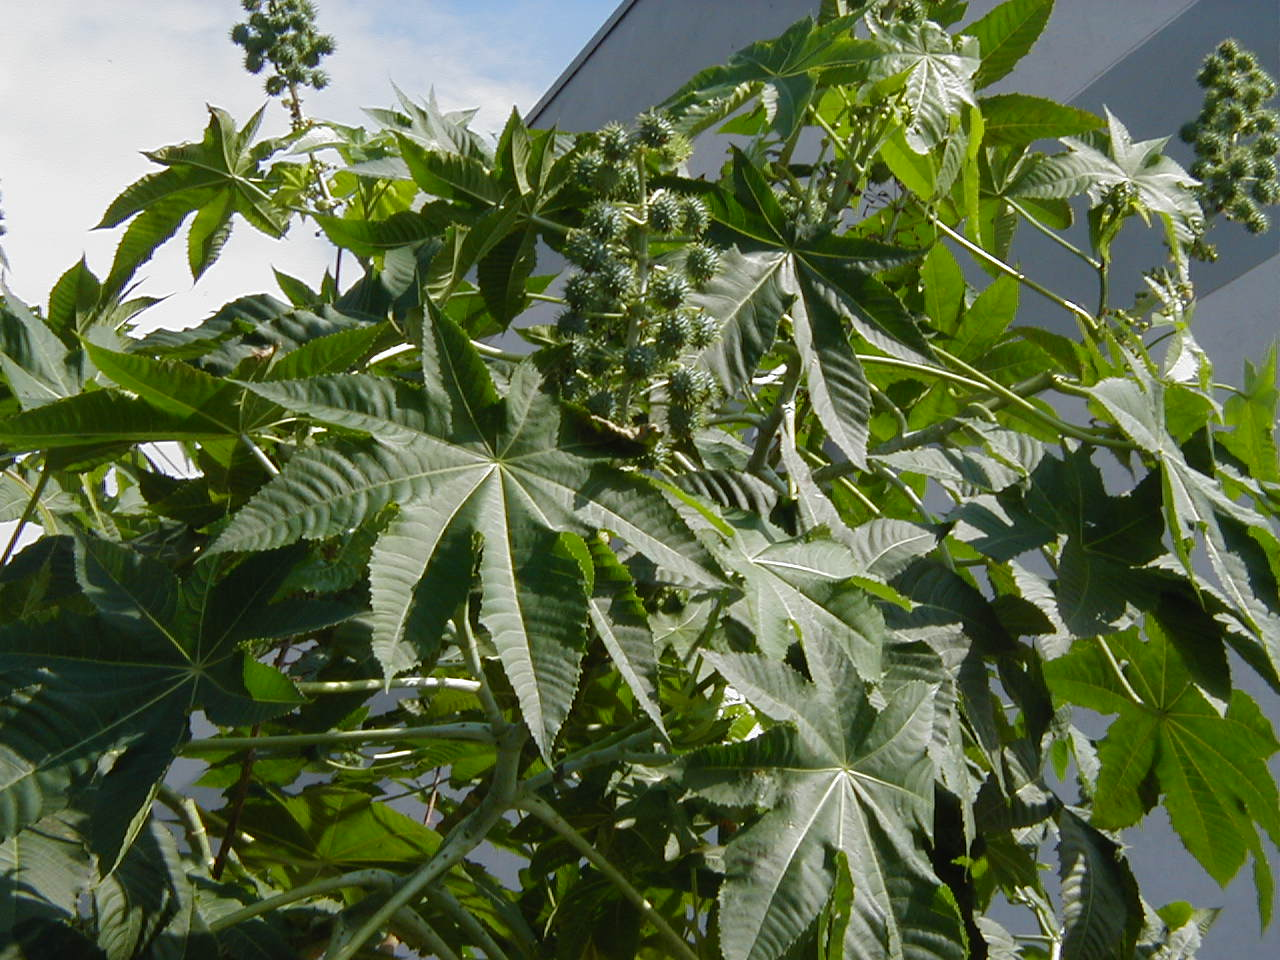 Plantas medicinales | Higuereta (Ricinus communis L)